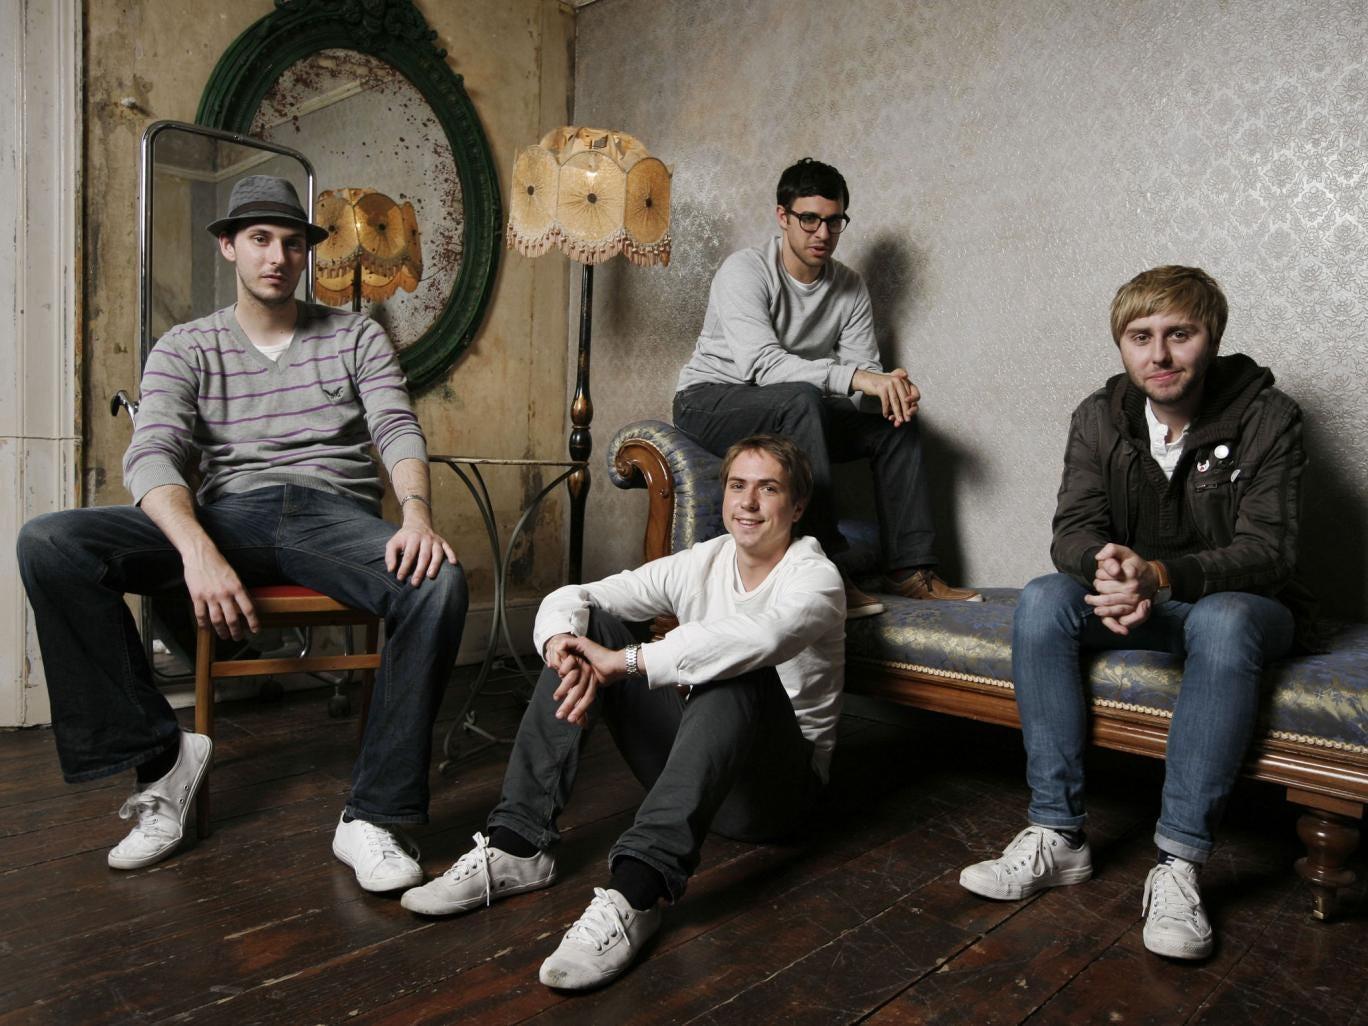 Stars of the massive hit TV show The Inbetweeners, Blake Harrison, Joe Thomas, Simon Bird and James Buckley